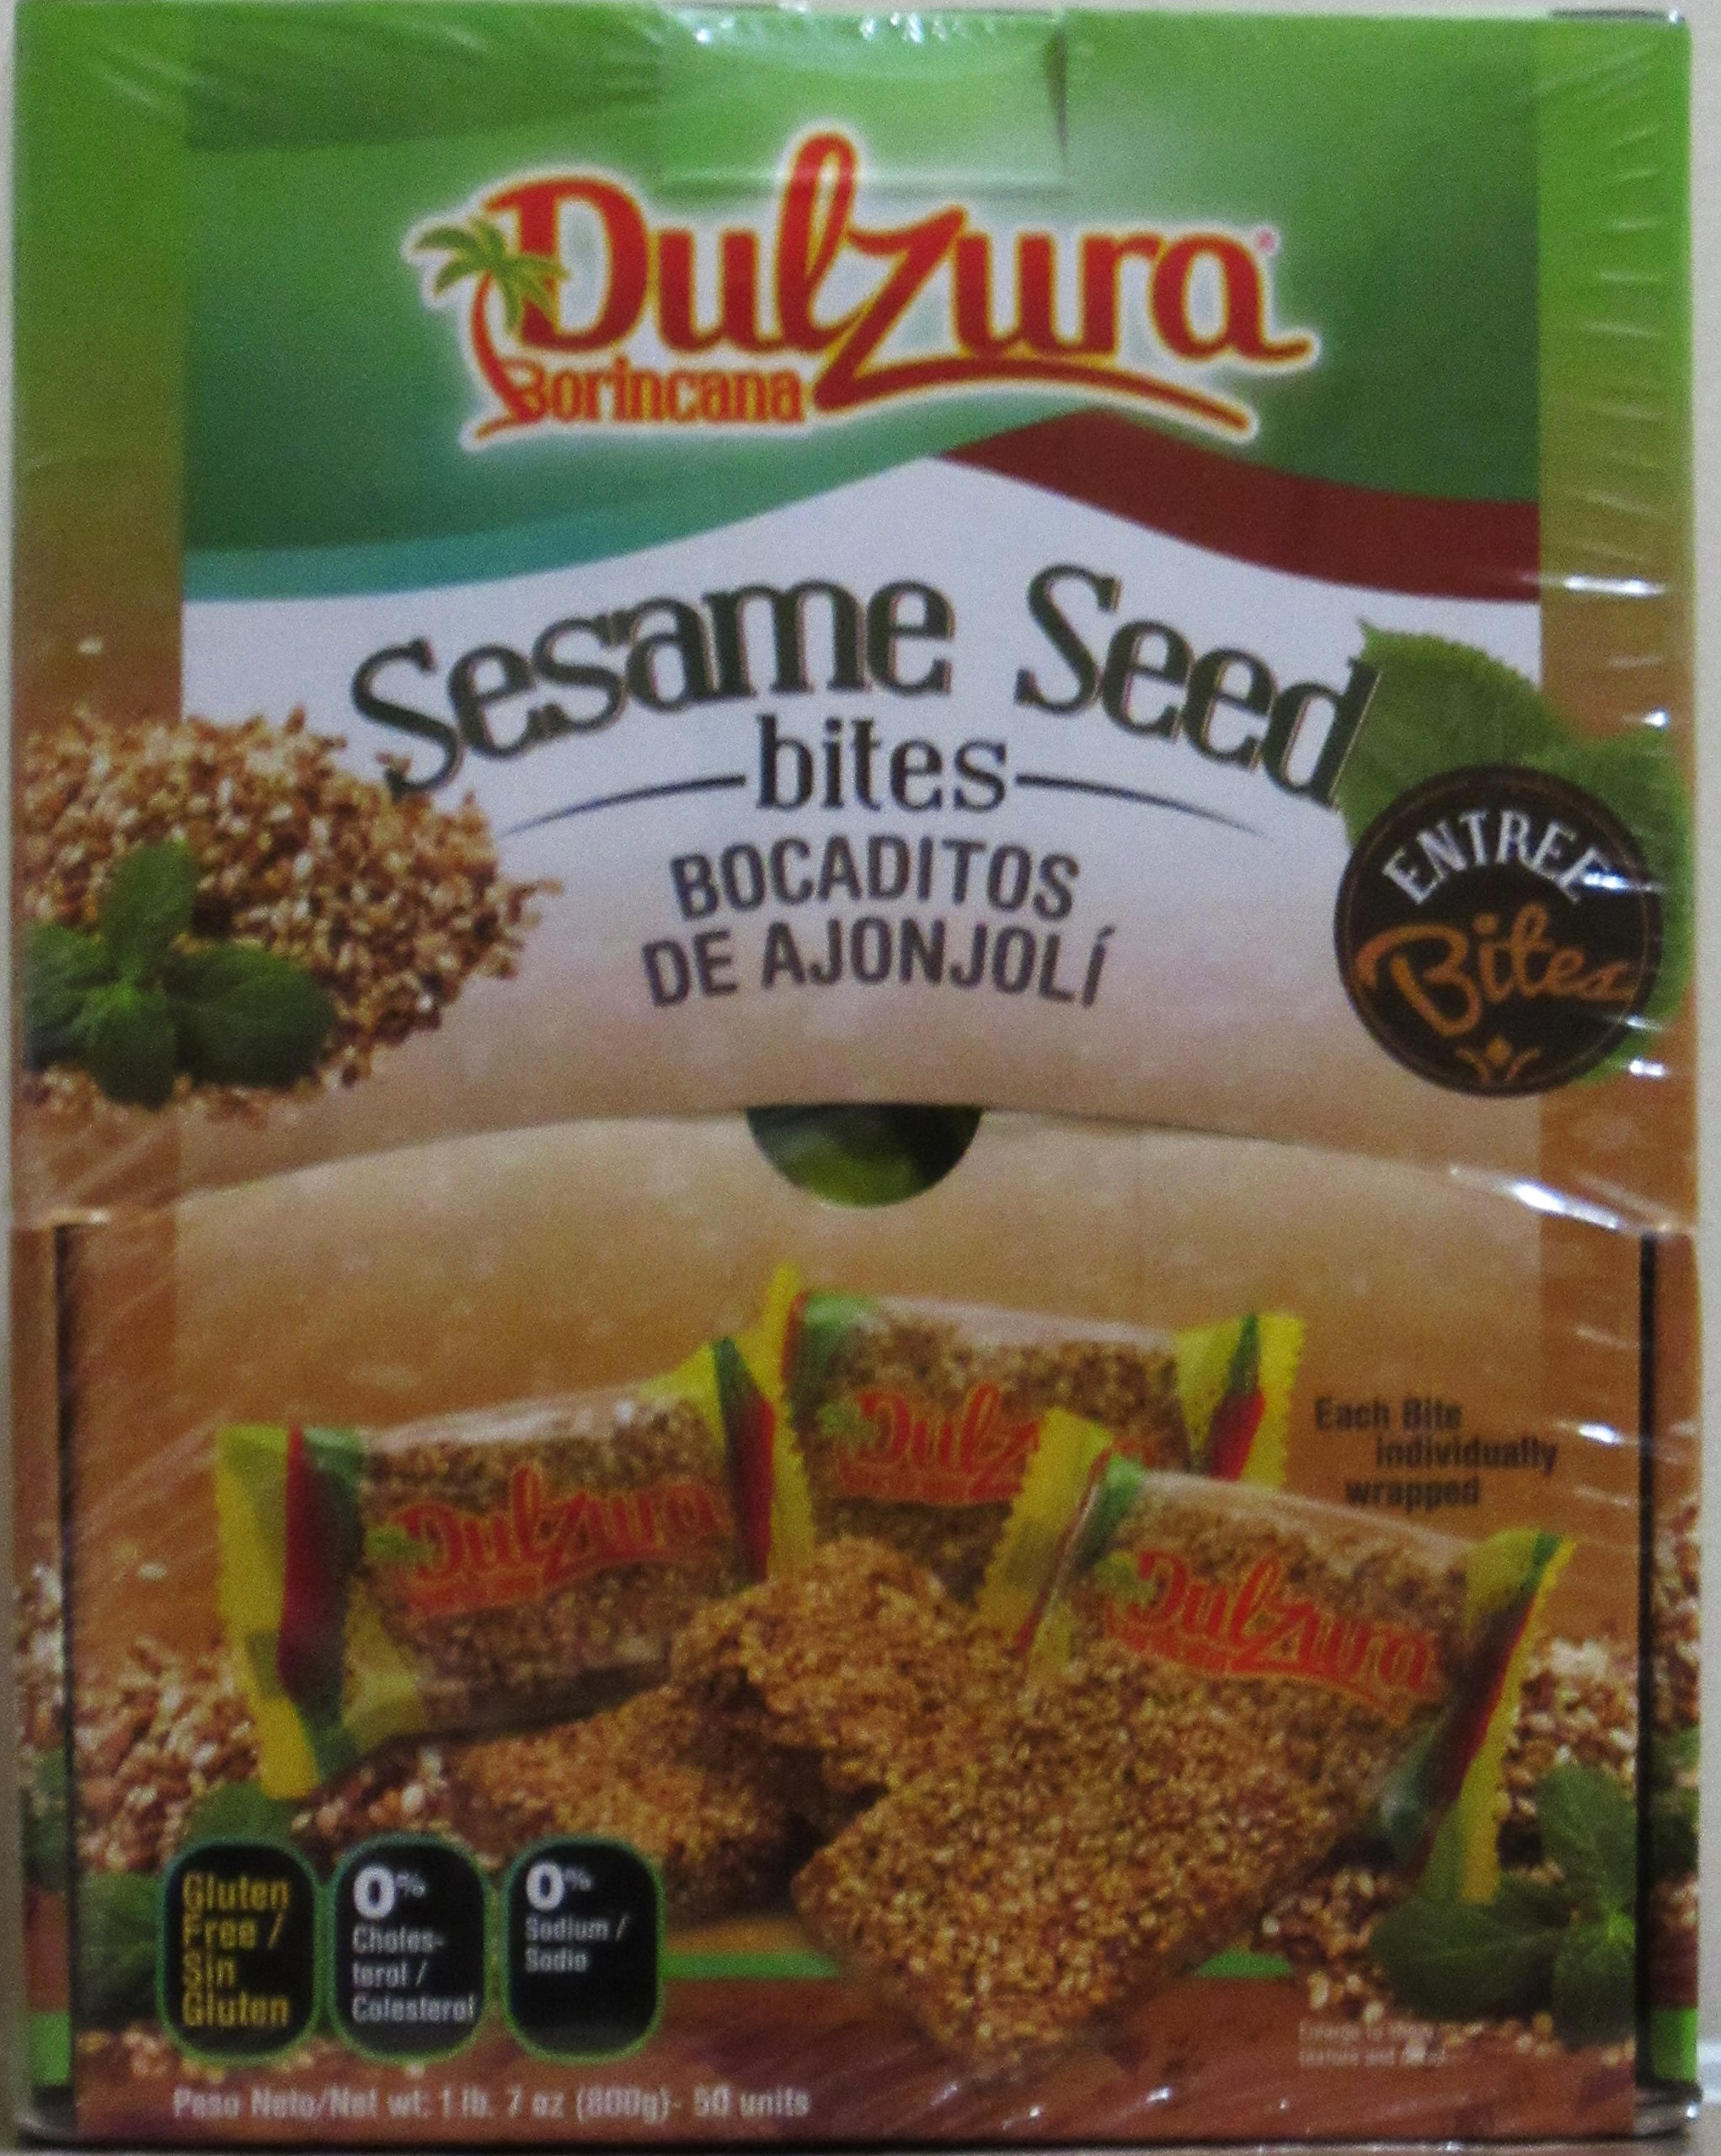 Dulzura Borincana Sesame Seed Bites - 50 Packs